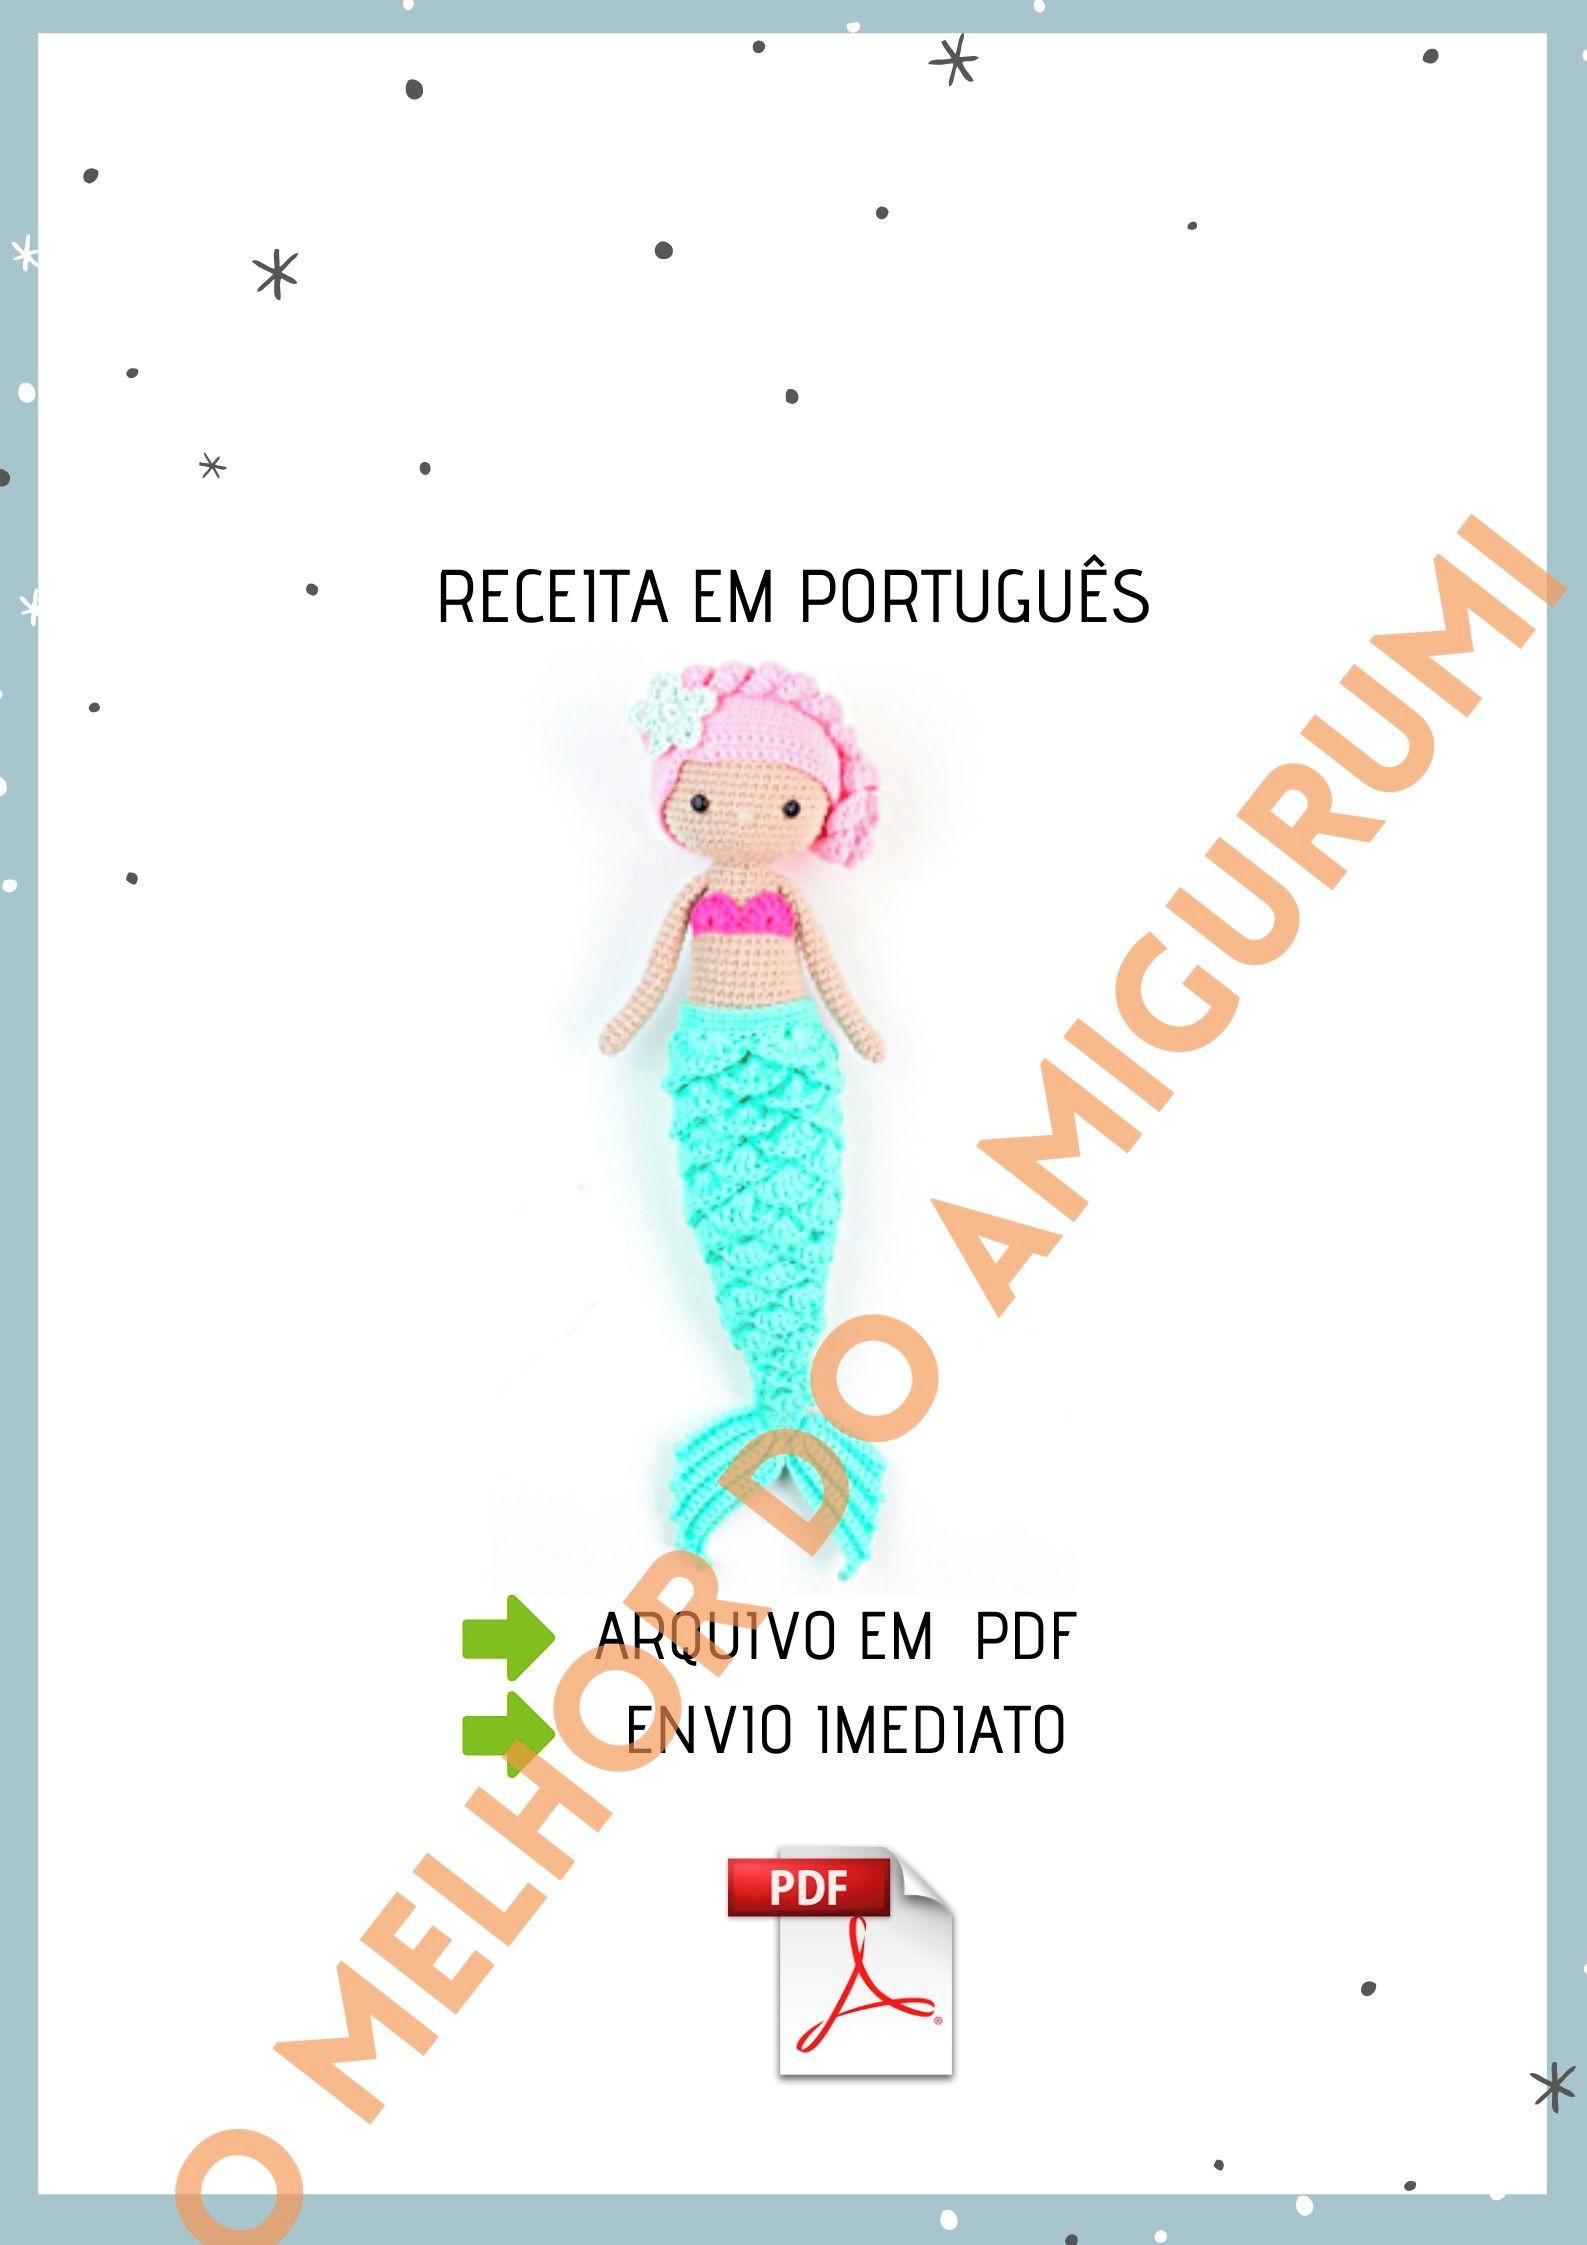 Receitas Amigurumi em Português, Receitas Amigurumi Boneca gratis ... | 2245x1587